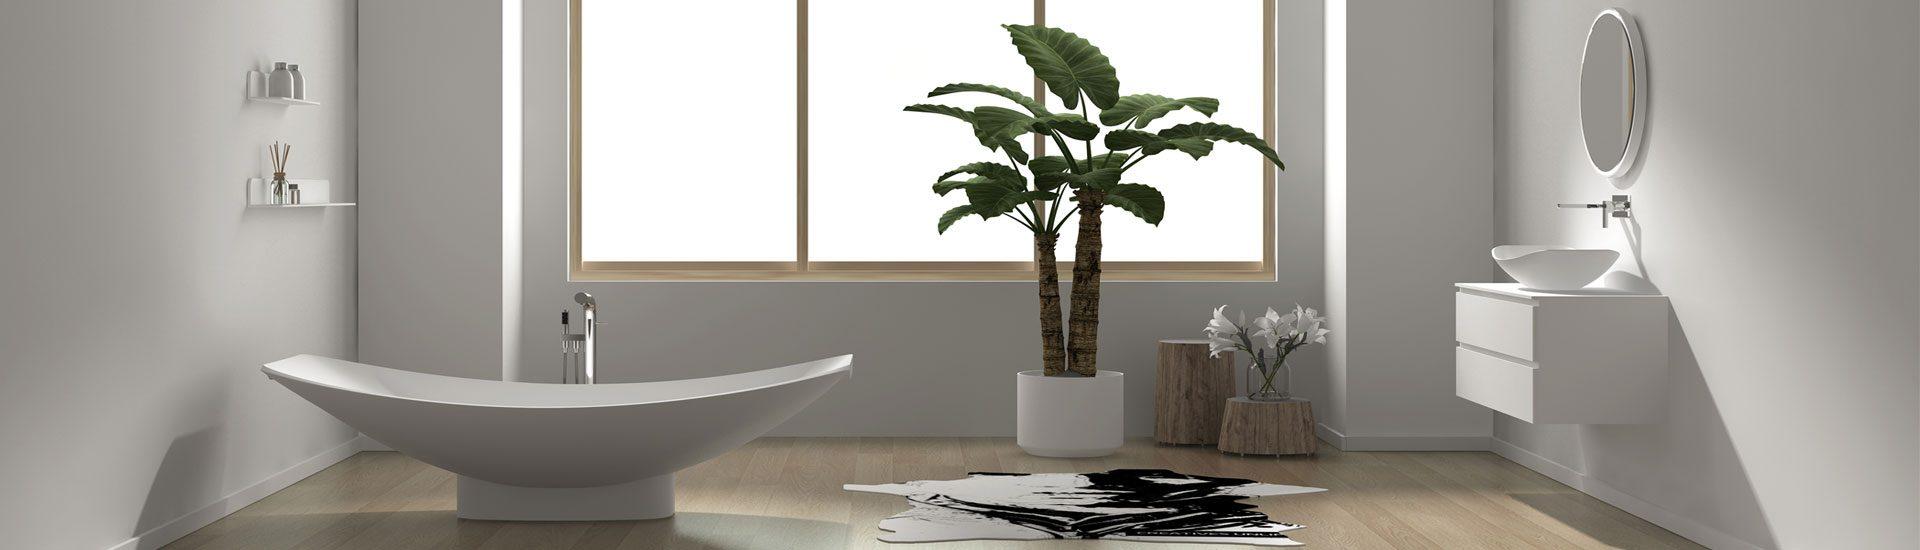 A freestanding hammock bathtub called a Mirage